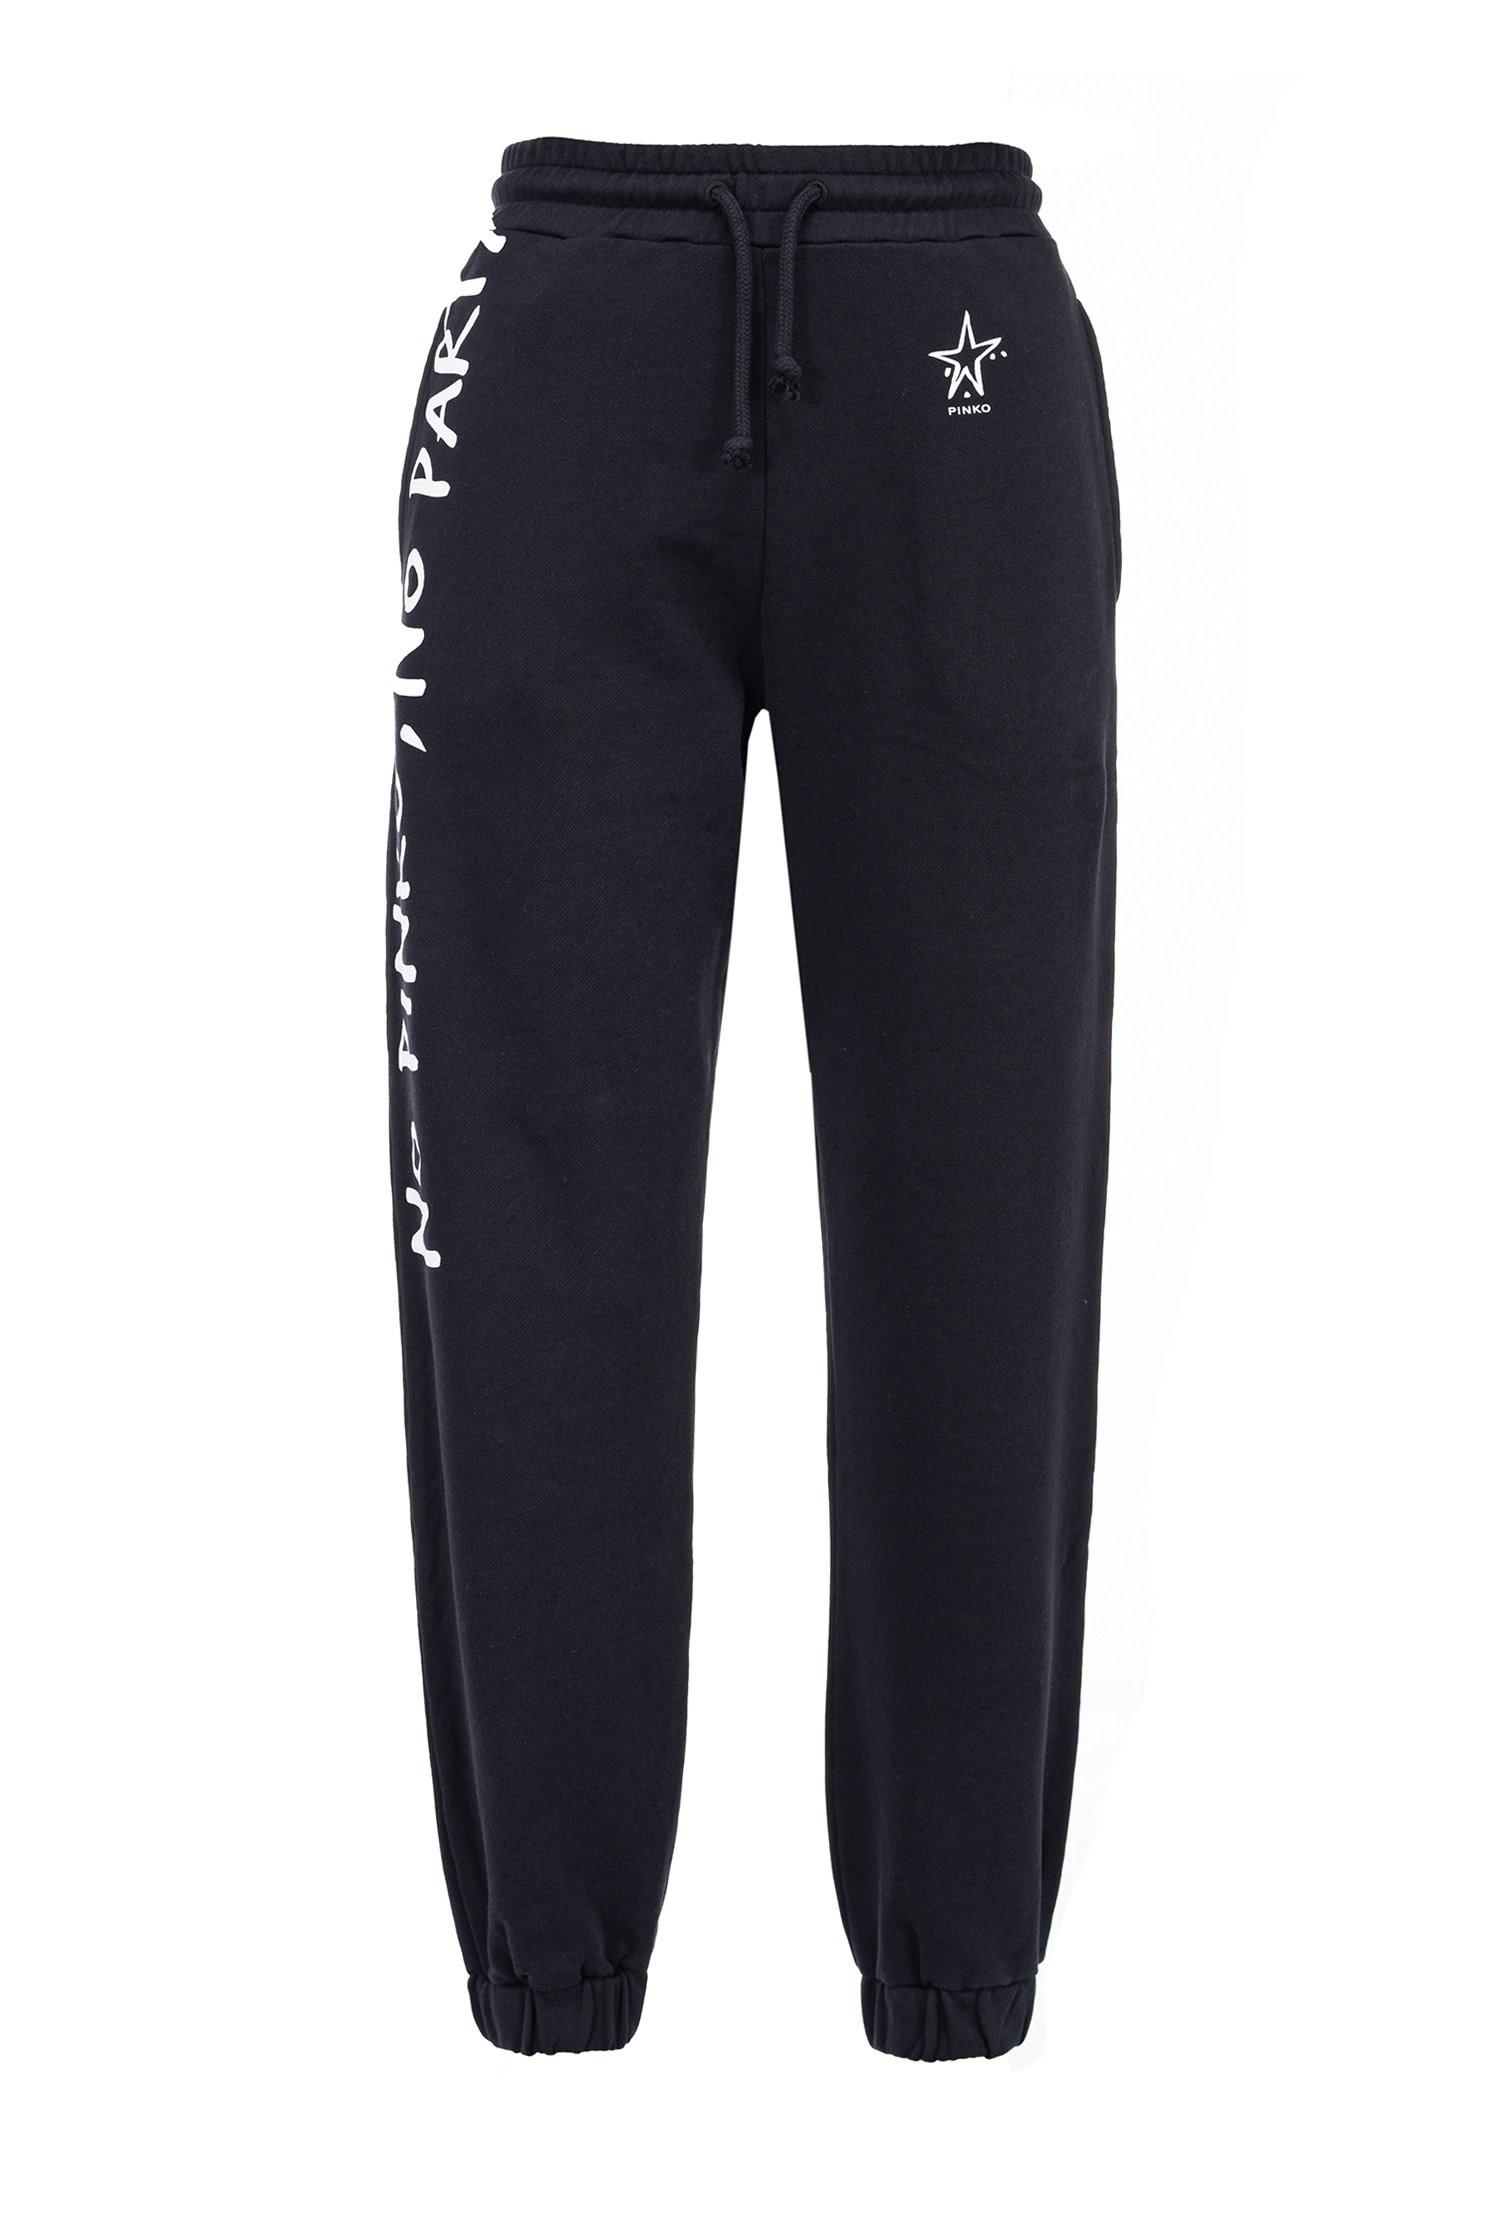 Pantaloni Enologia joggers in felpa Pinko.